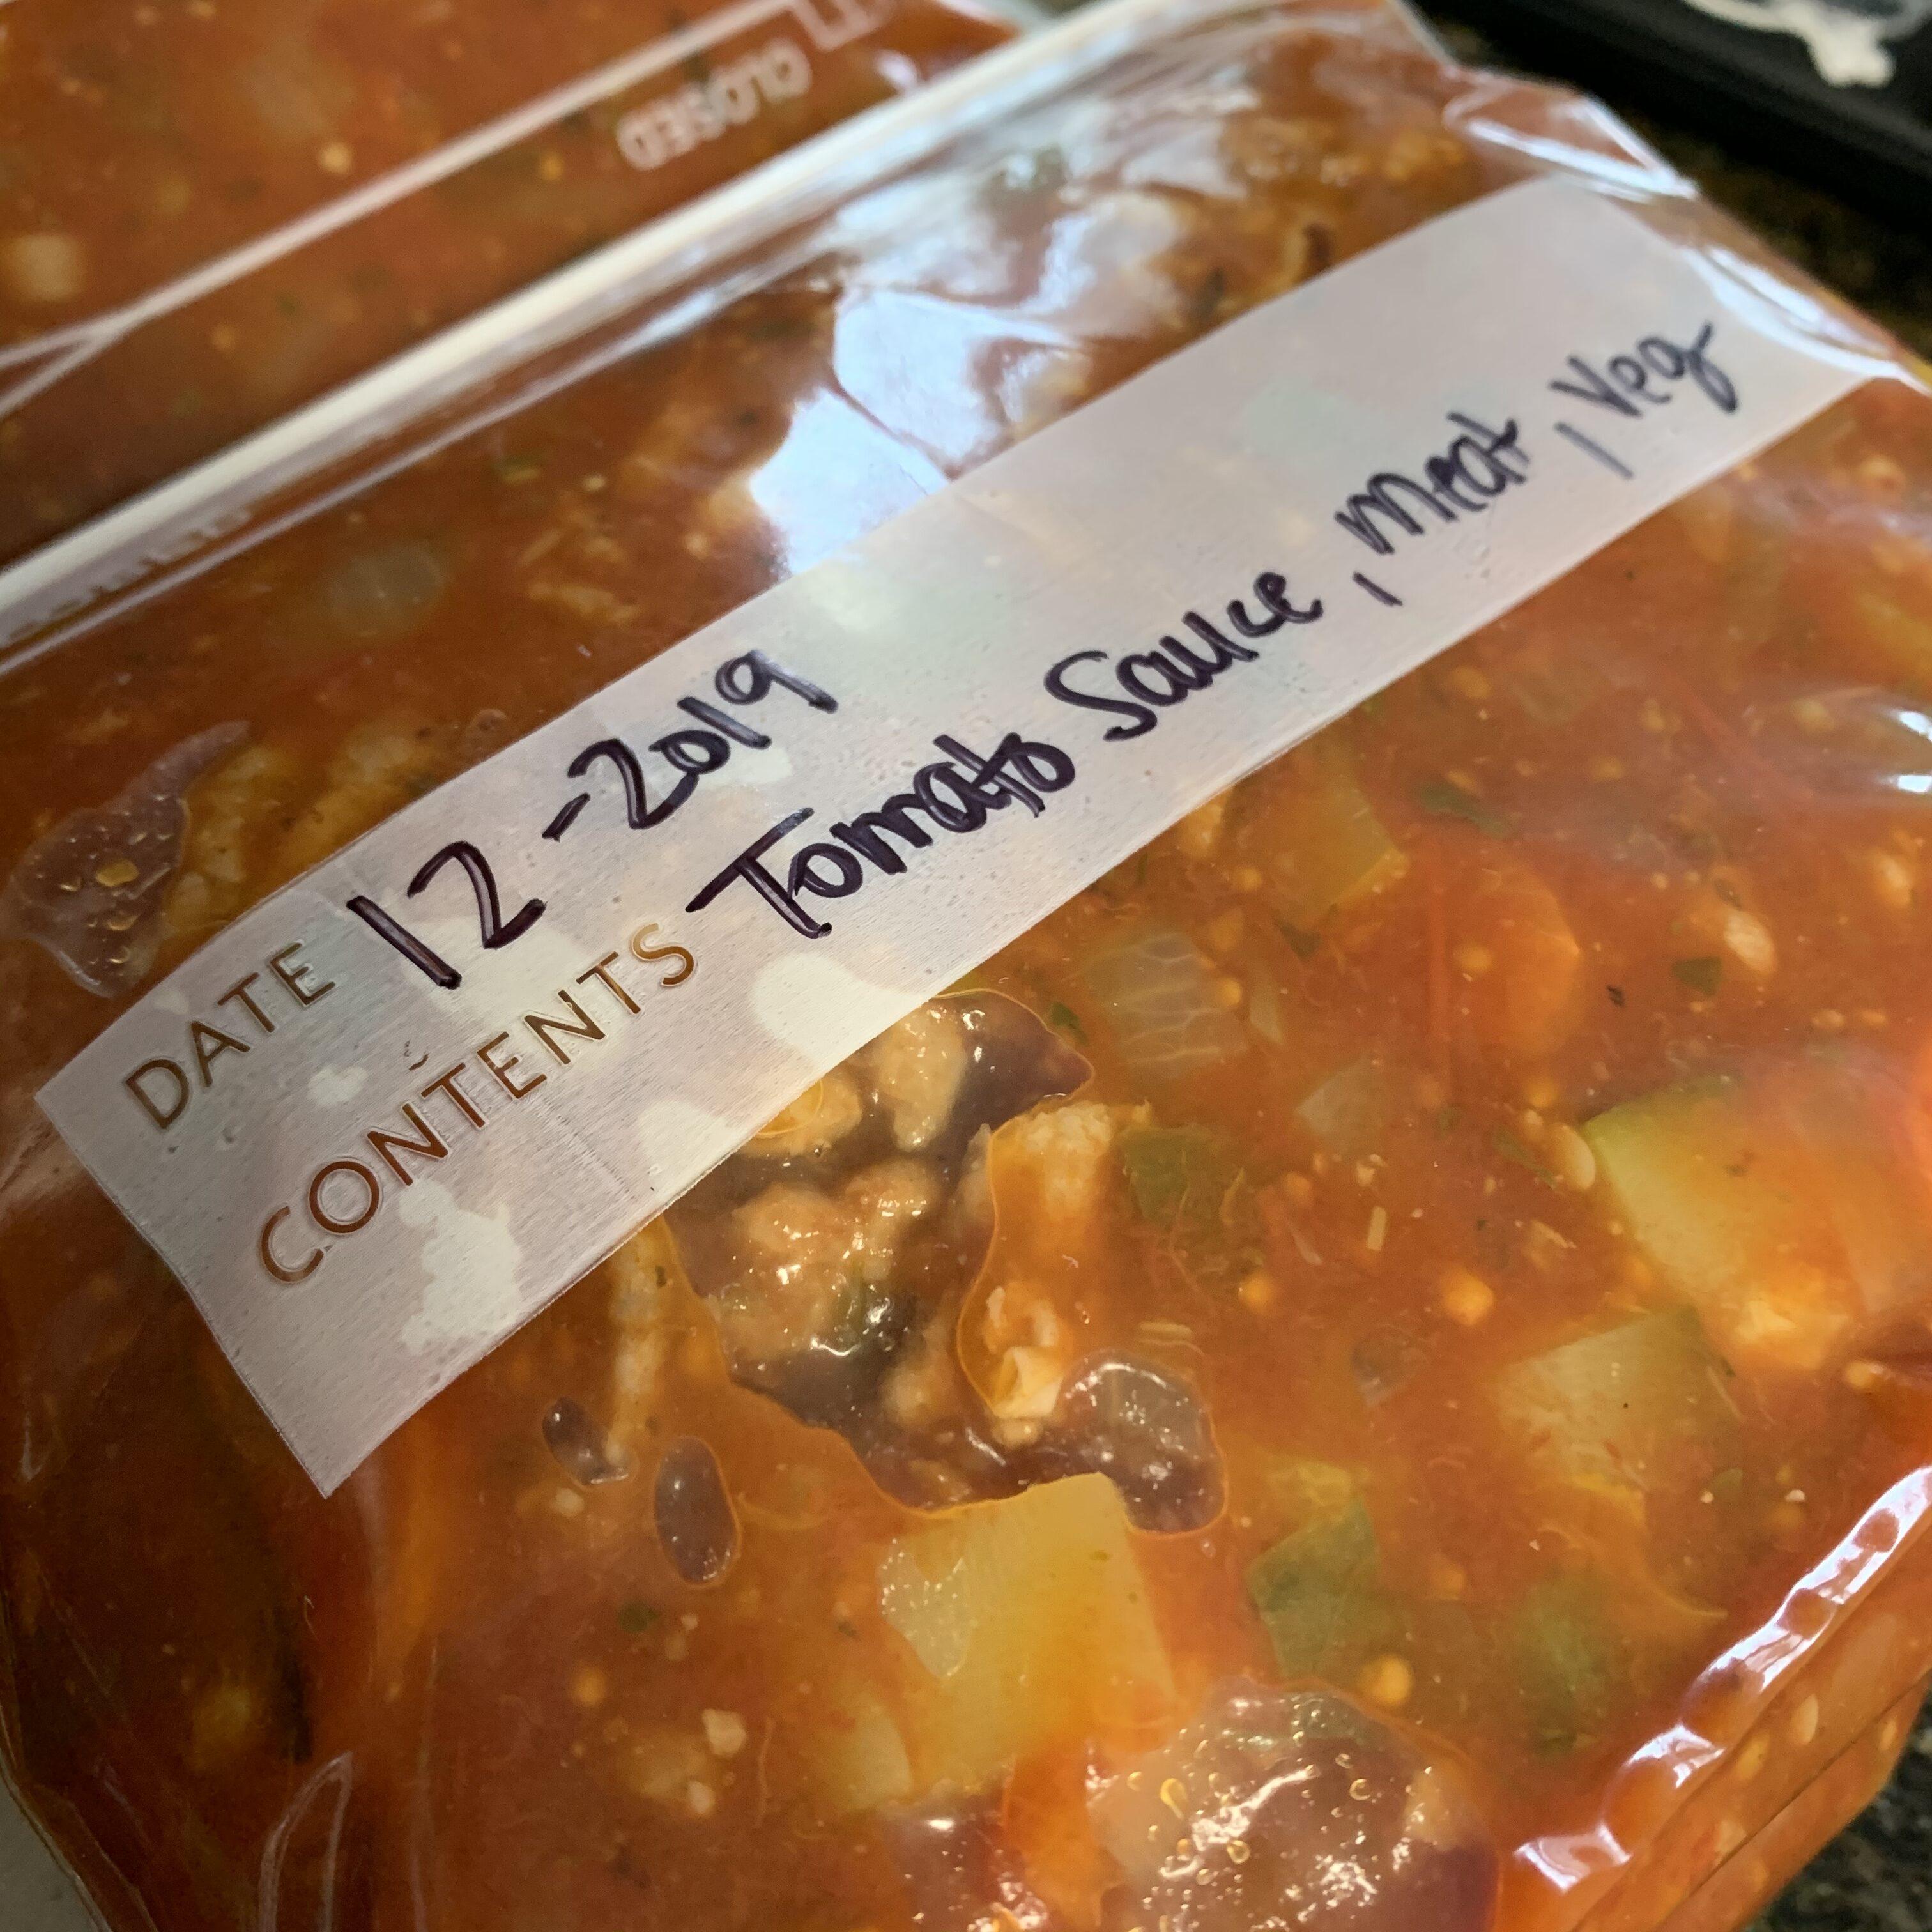 7192C6DA 3A22 411B 95EB E5627327453B Tomato Sauce!